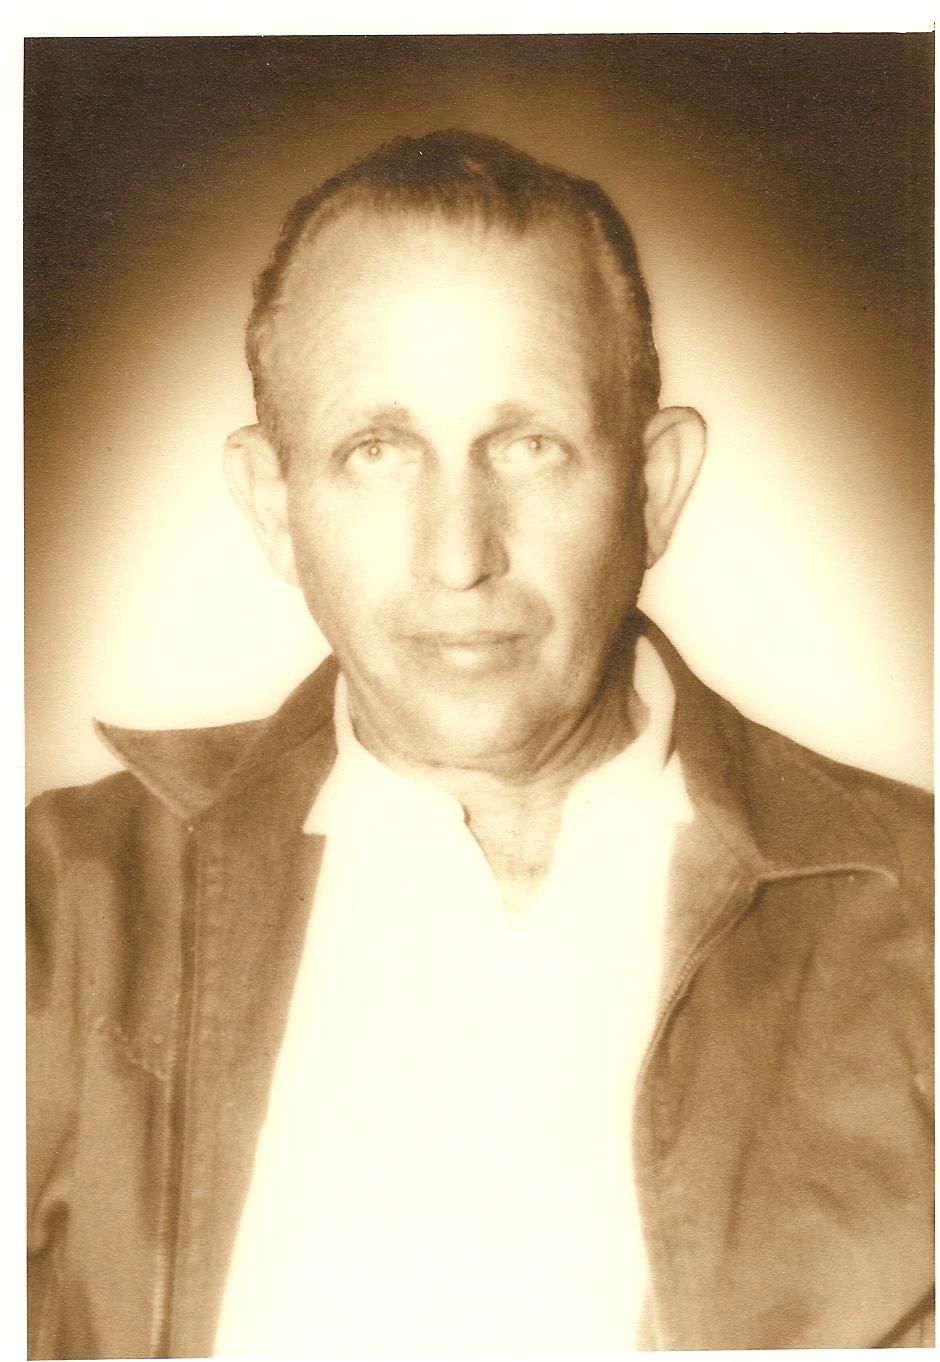 Sheriff Charles Edward Stevens, Jr. | Atchison County Sheriff's Office, Missouri